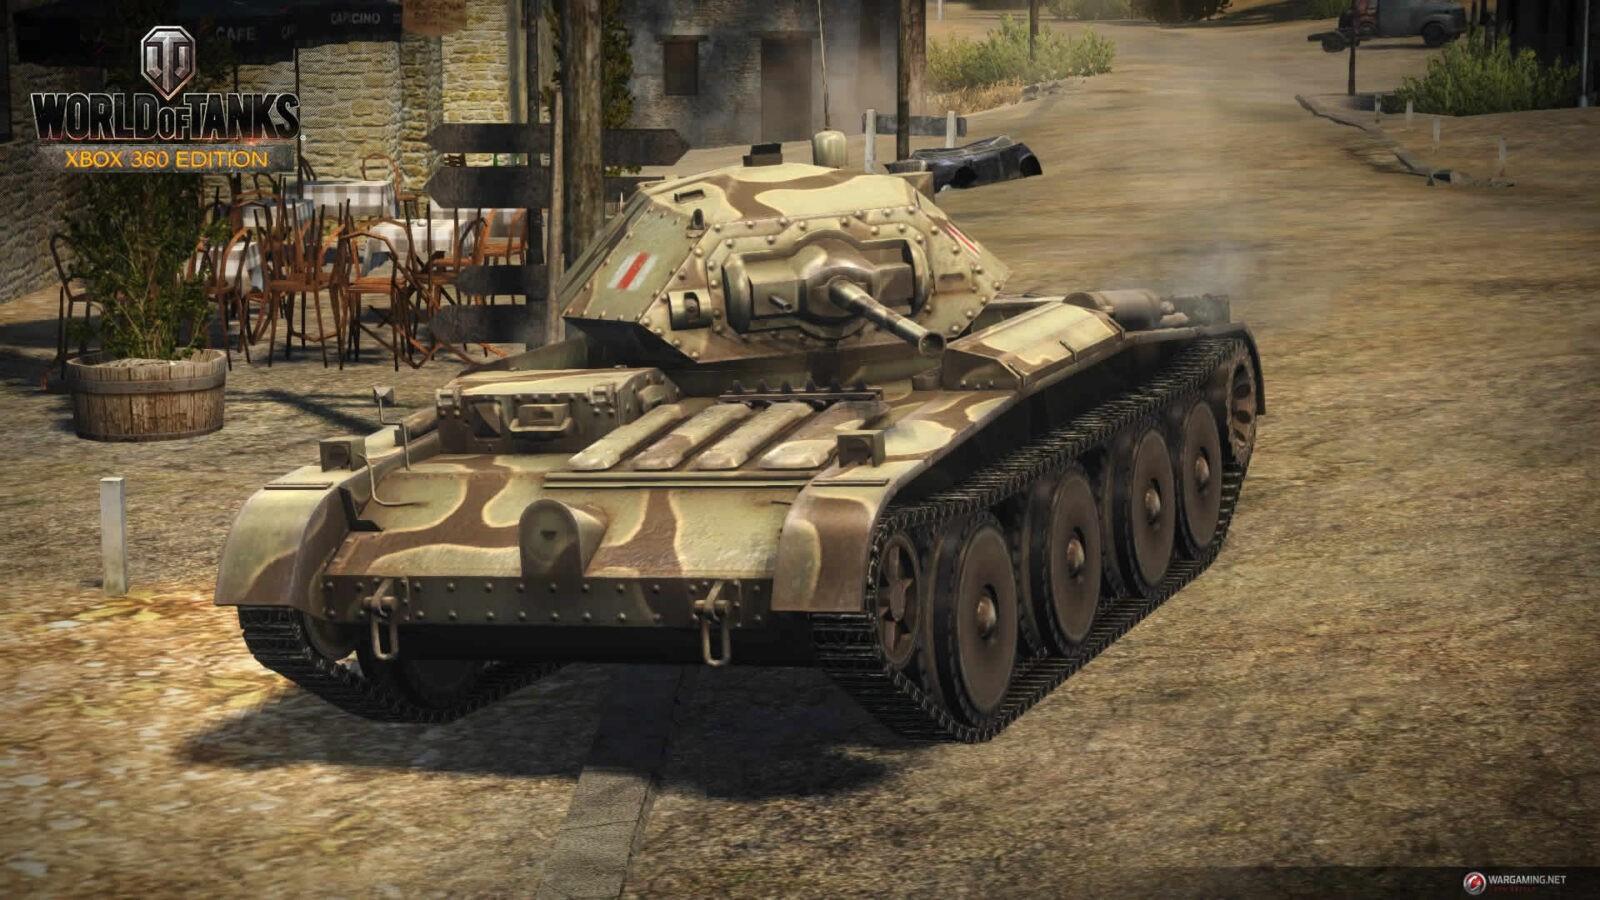 World of Tanks: Xbox 360 Edition (XBOX360) 2